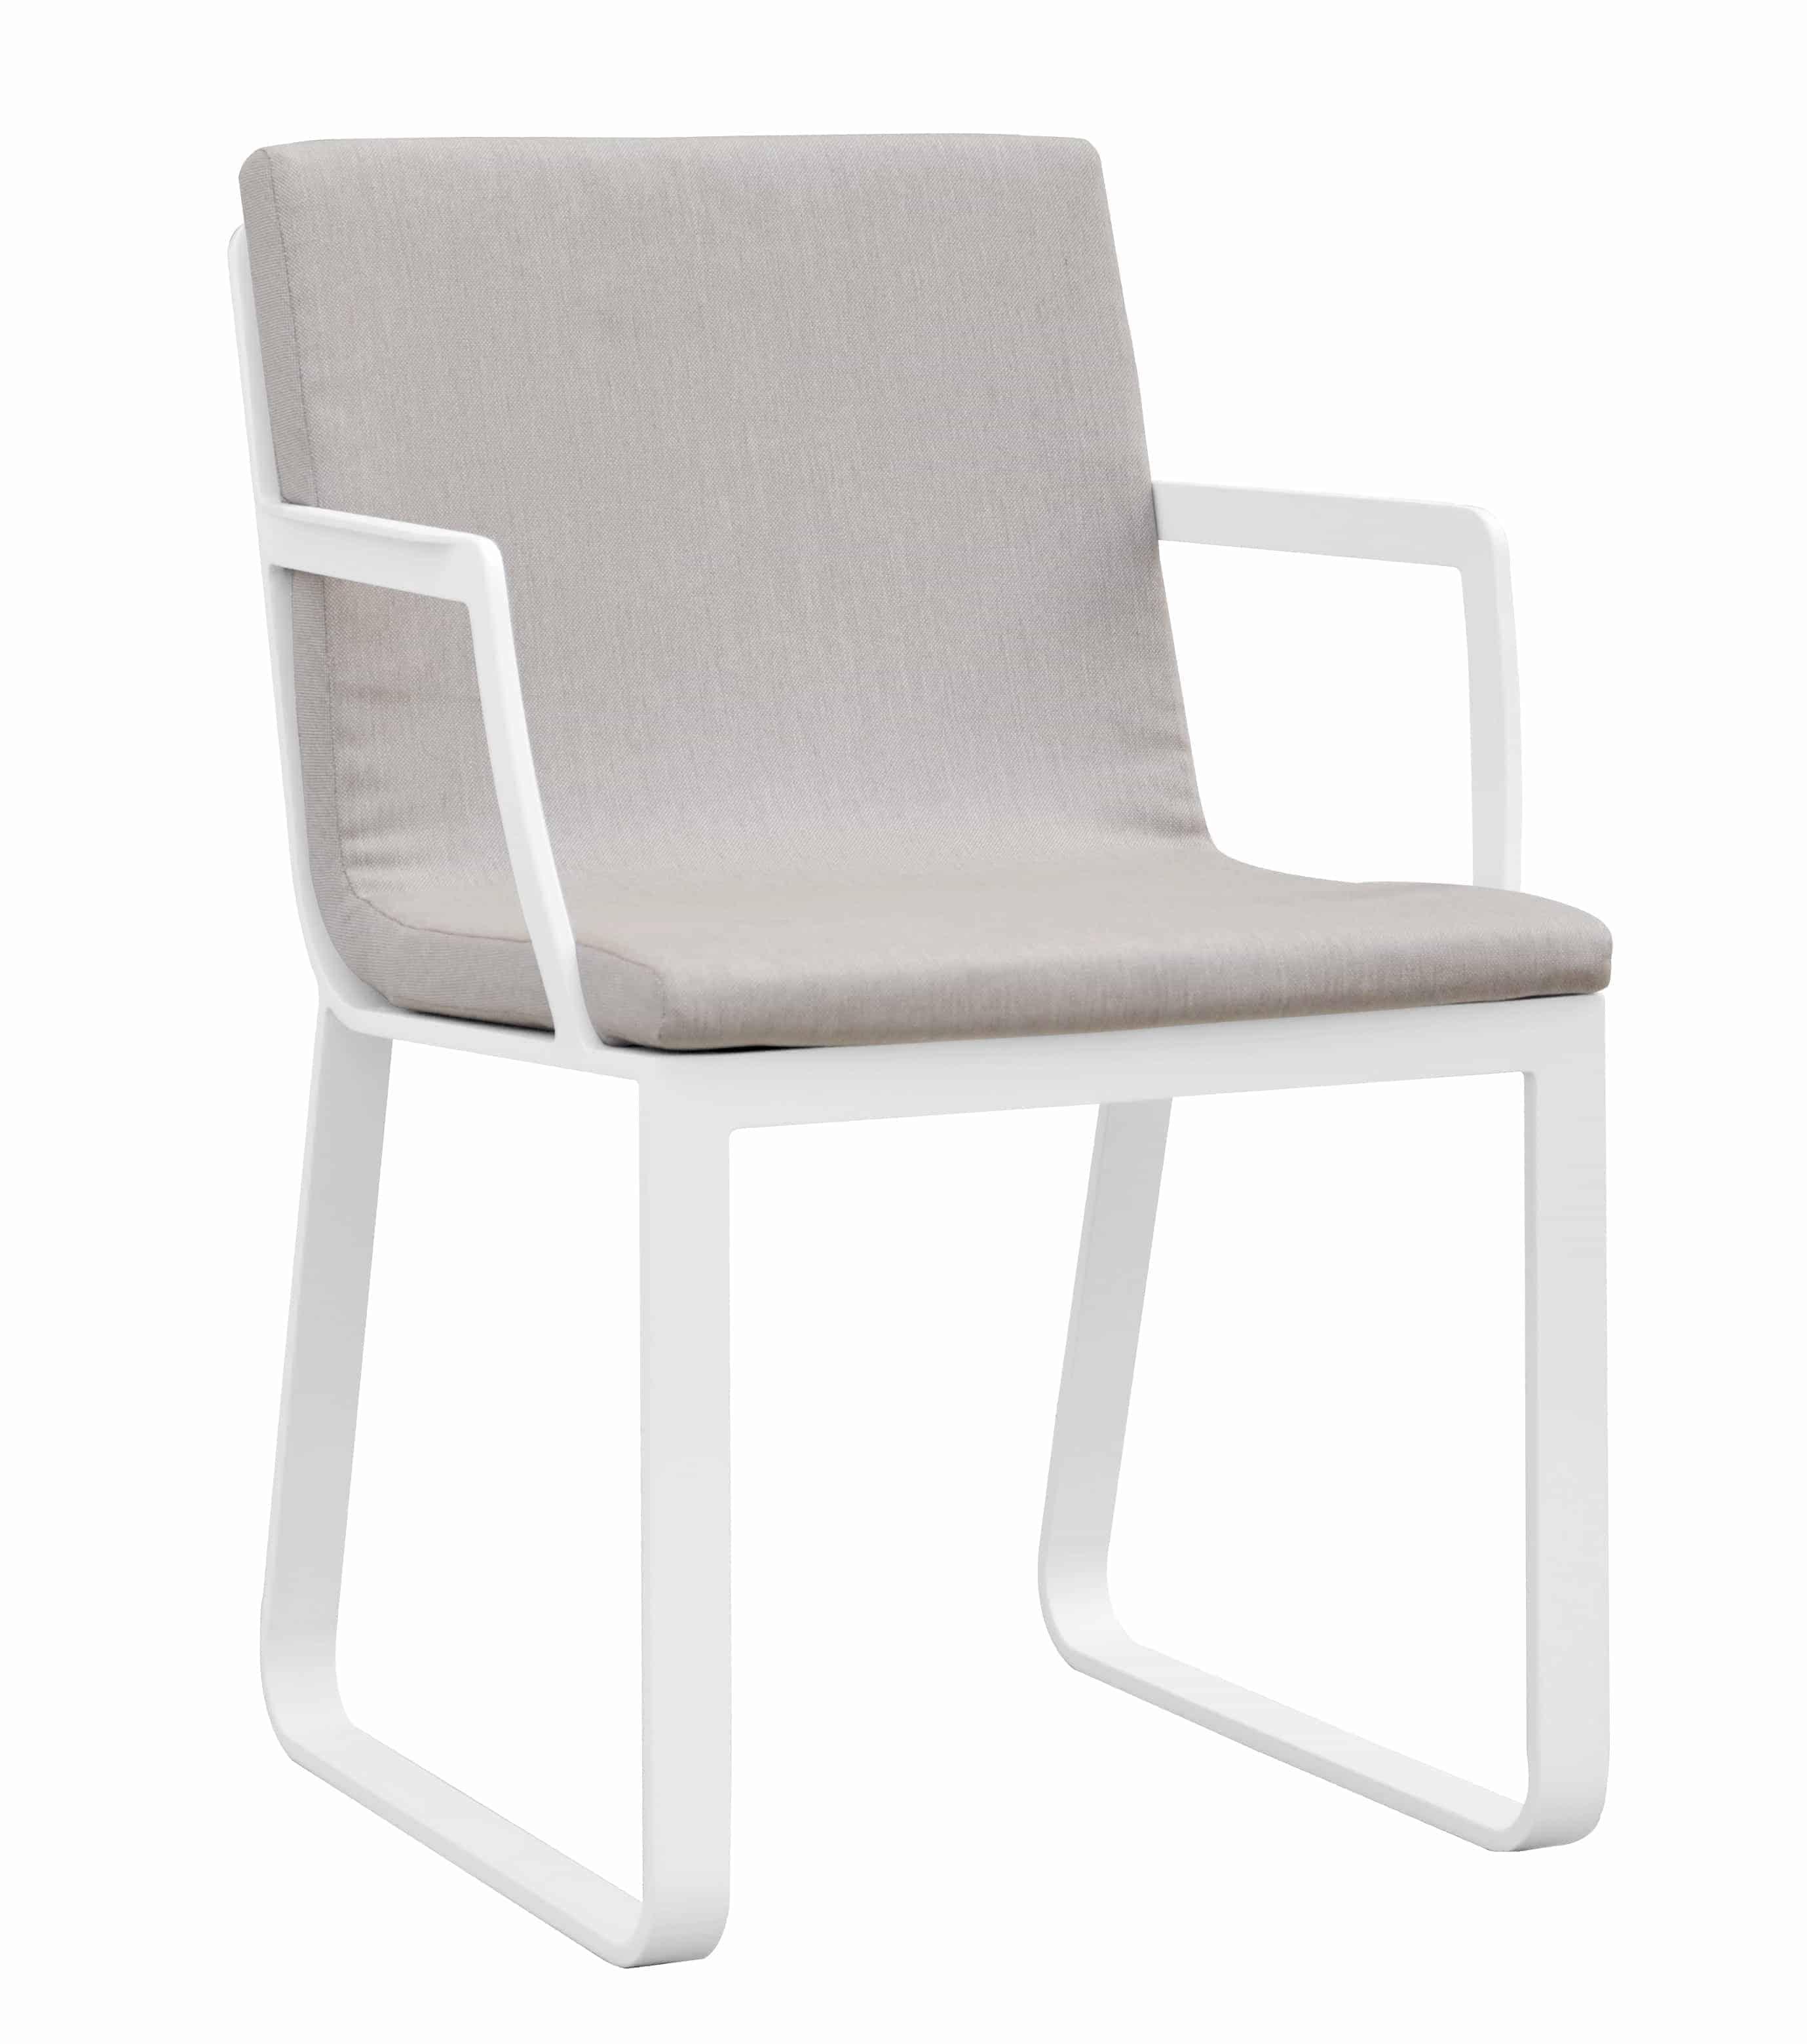 christmas chair covers ireland for lift recliners outdoor garden furniture dublin fano 110cm 4